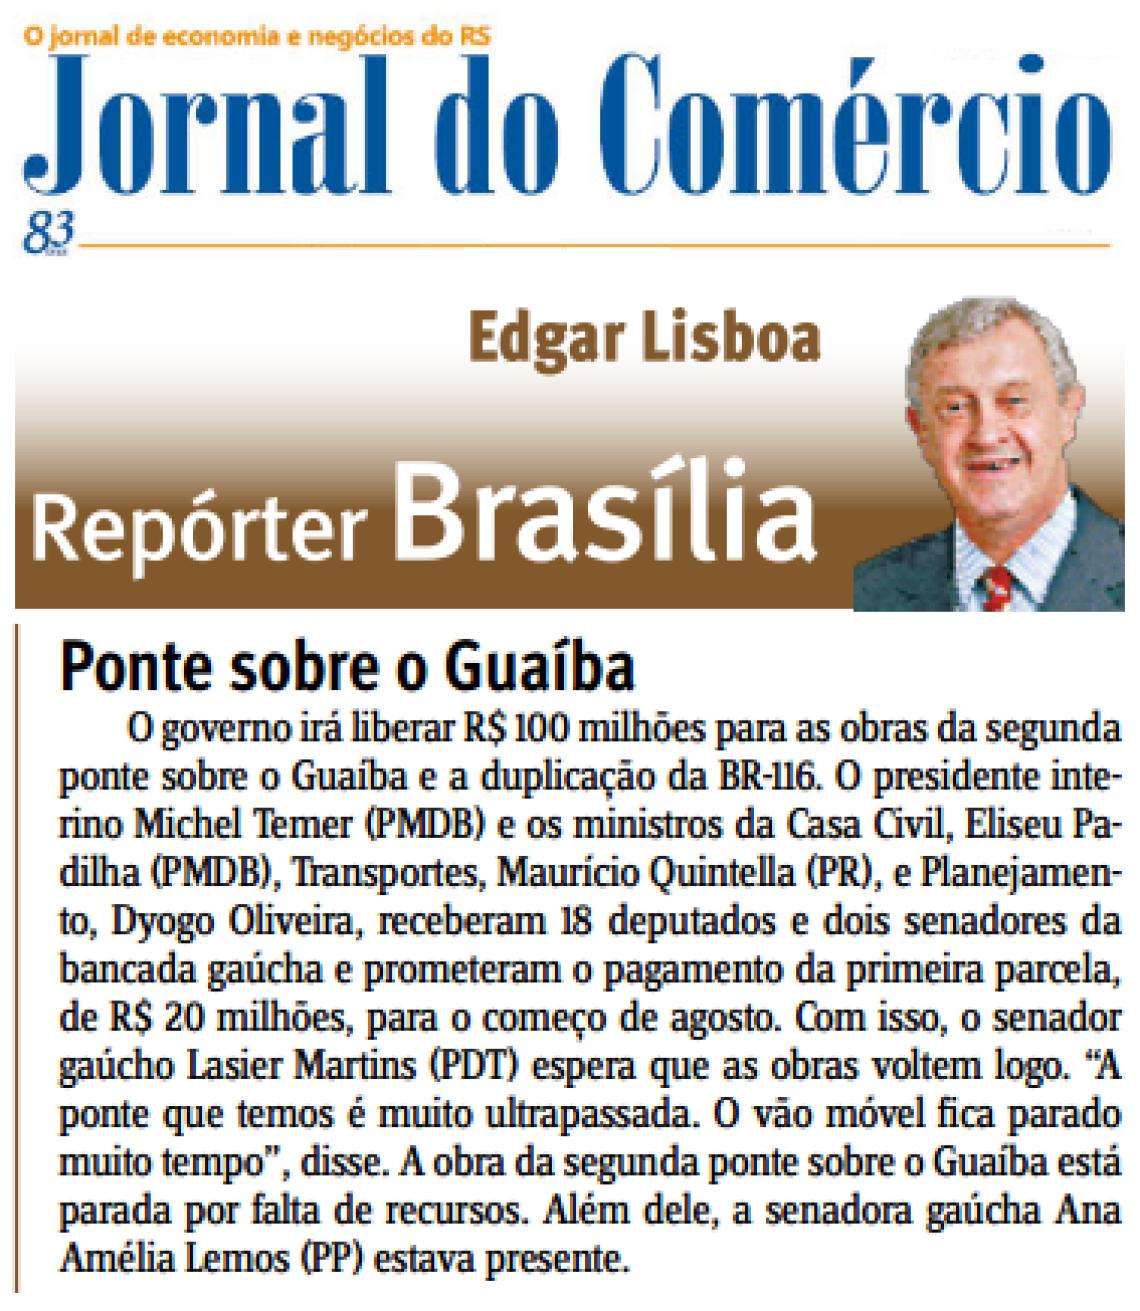 Jornal do Comércio: Edgar Lisboa - Ponte sobre o Guaíba